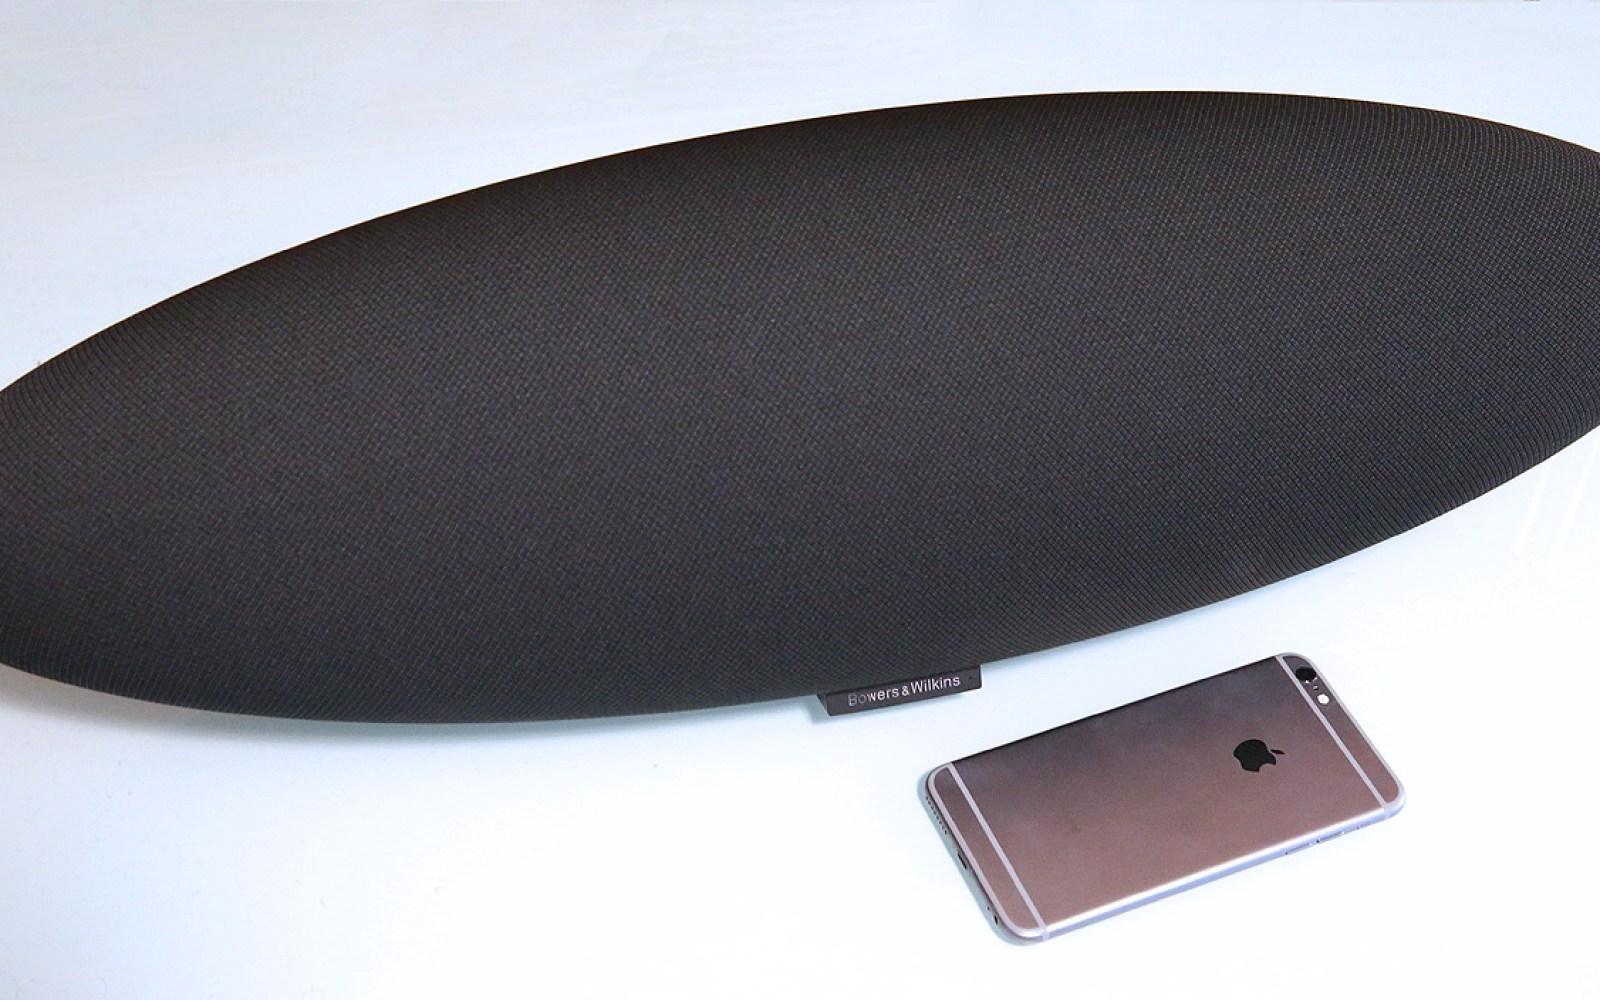 Review Bowers Wilkins Zeppelin Wireless Finally Brings Bluetooth